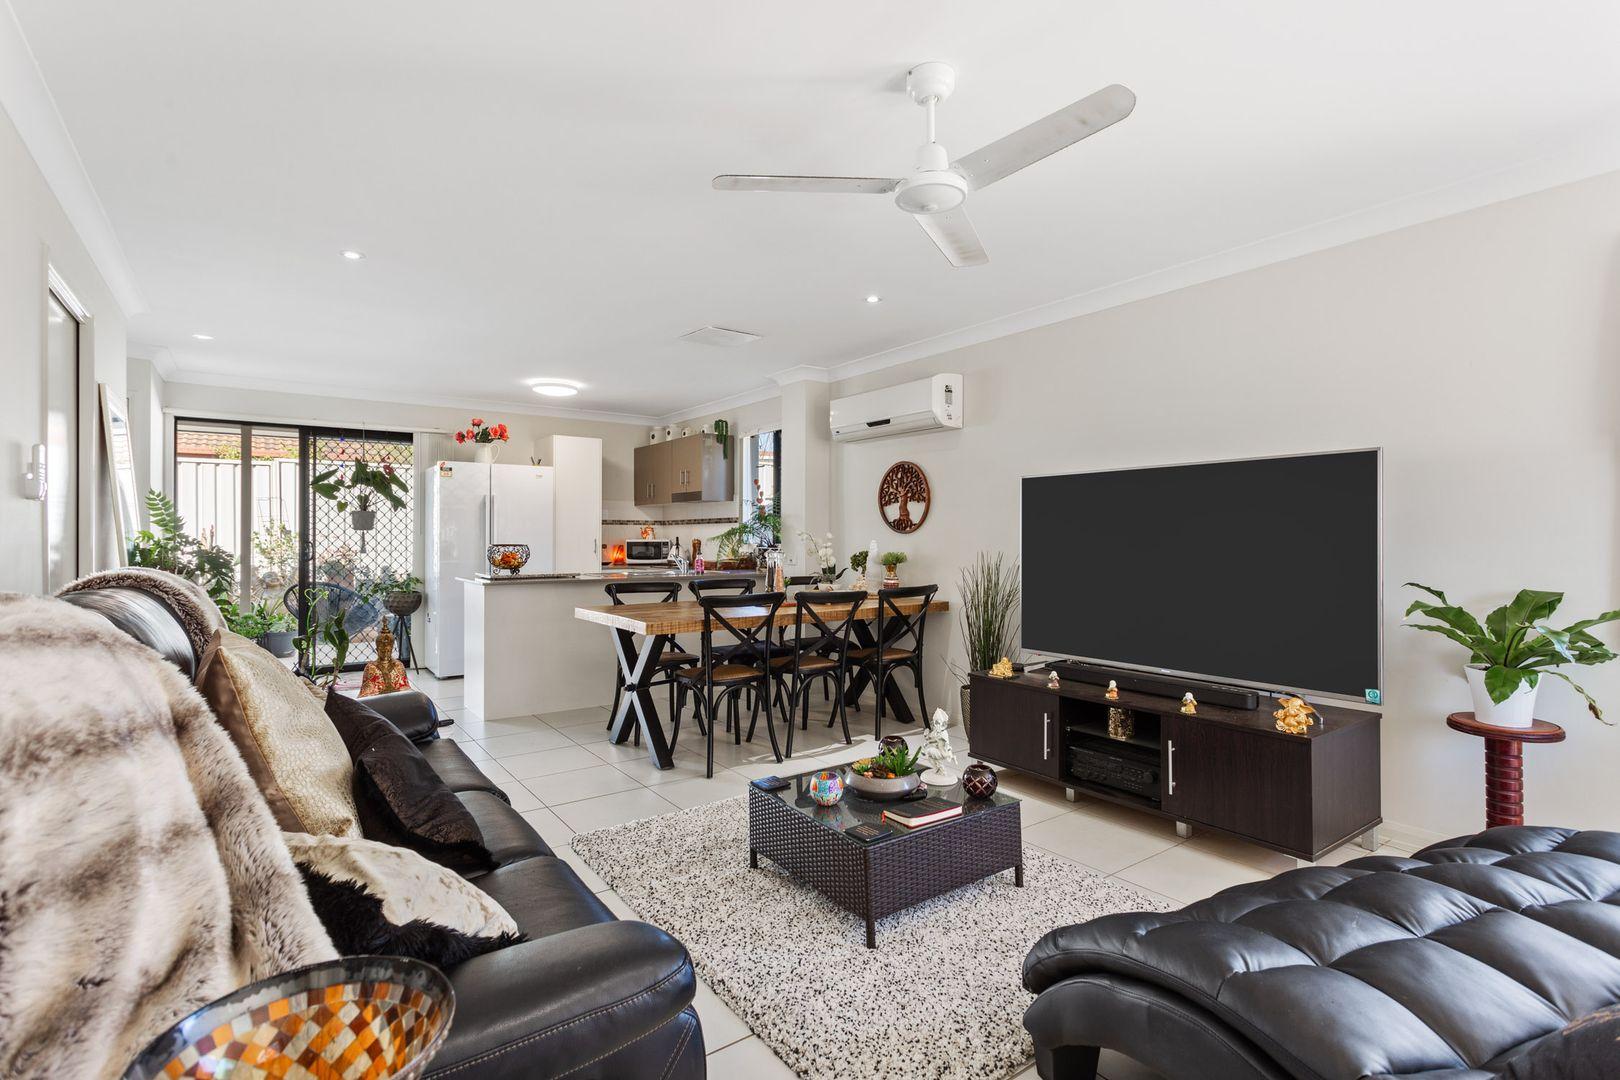 14/24 Avondale St, Newtown QLD 4350, Image 0